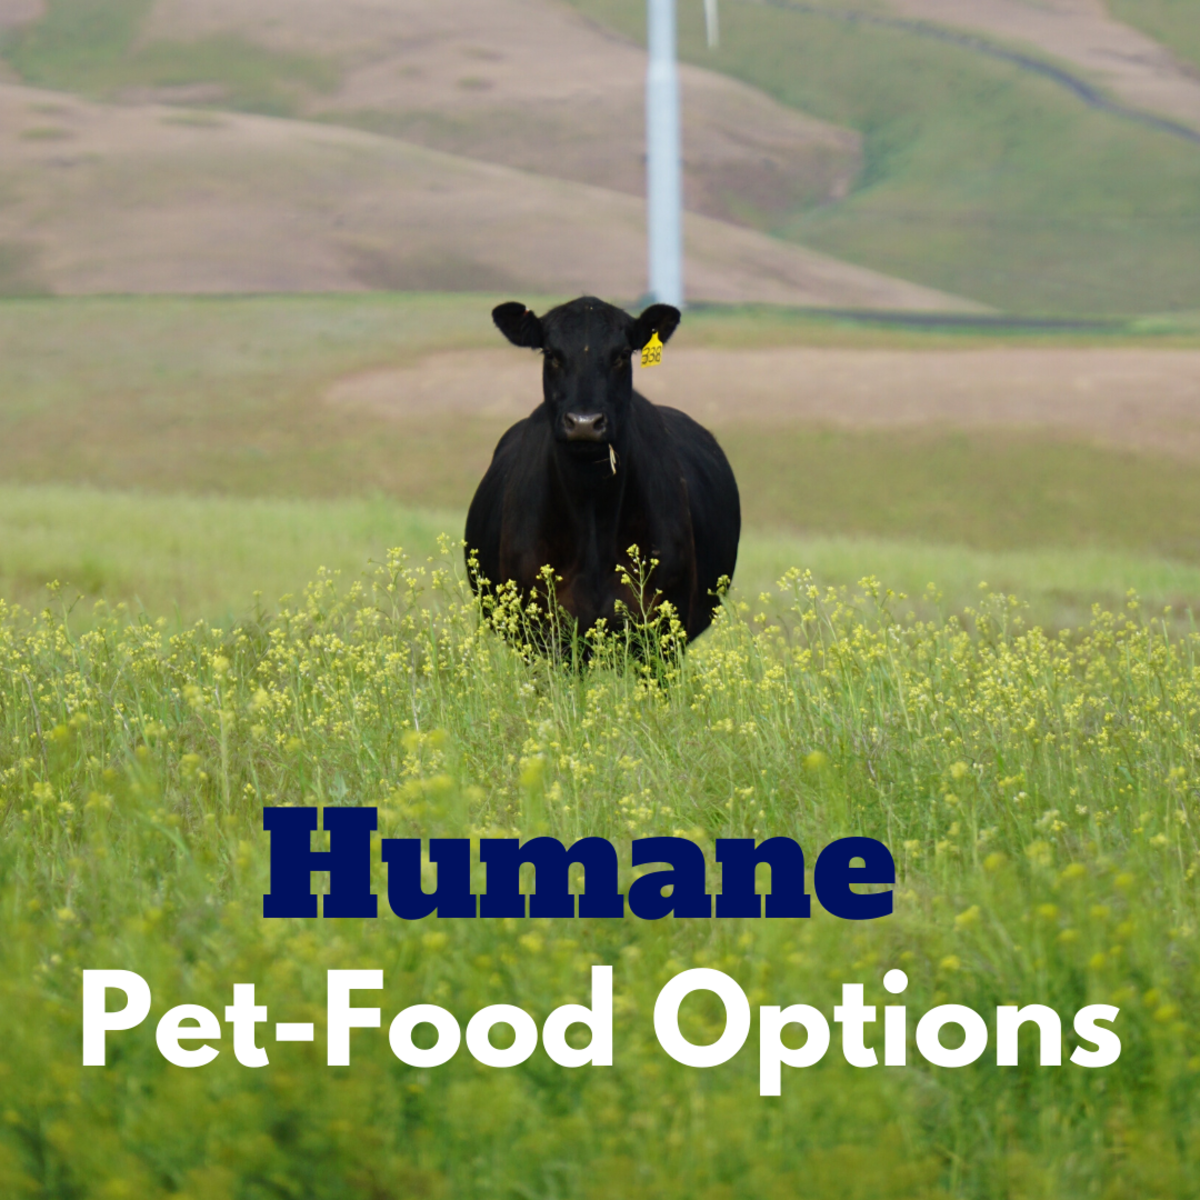 Organic, Free-Range, and Humane Dog and Cat Food Options